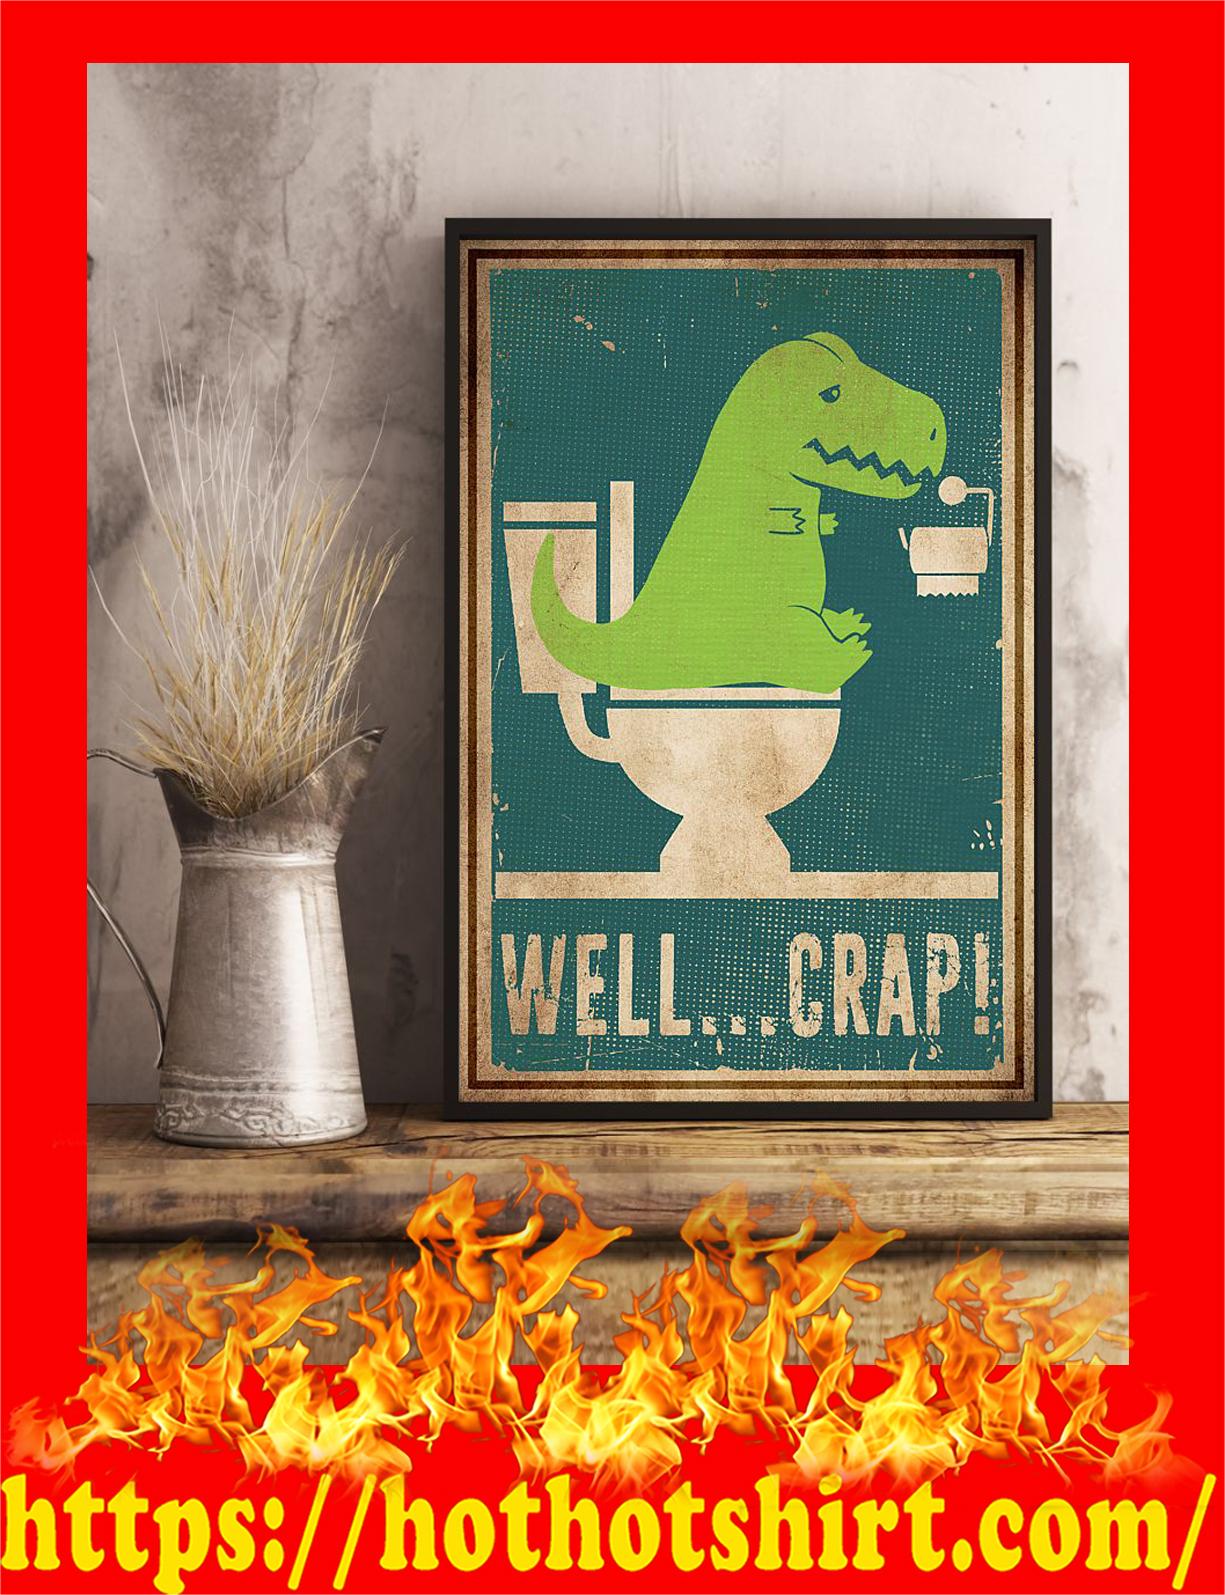 Well crap dinosaur t-rex poster - pic 3